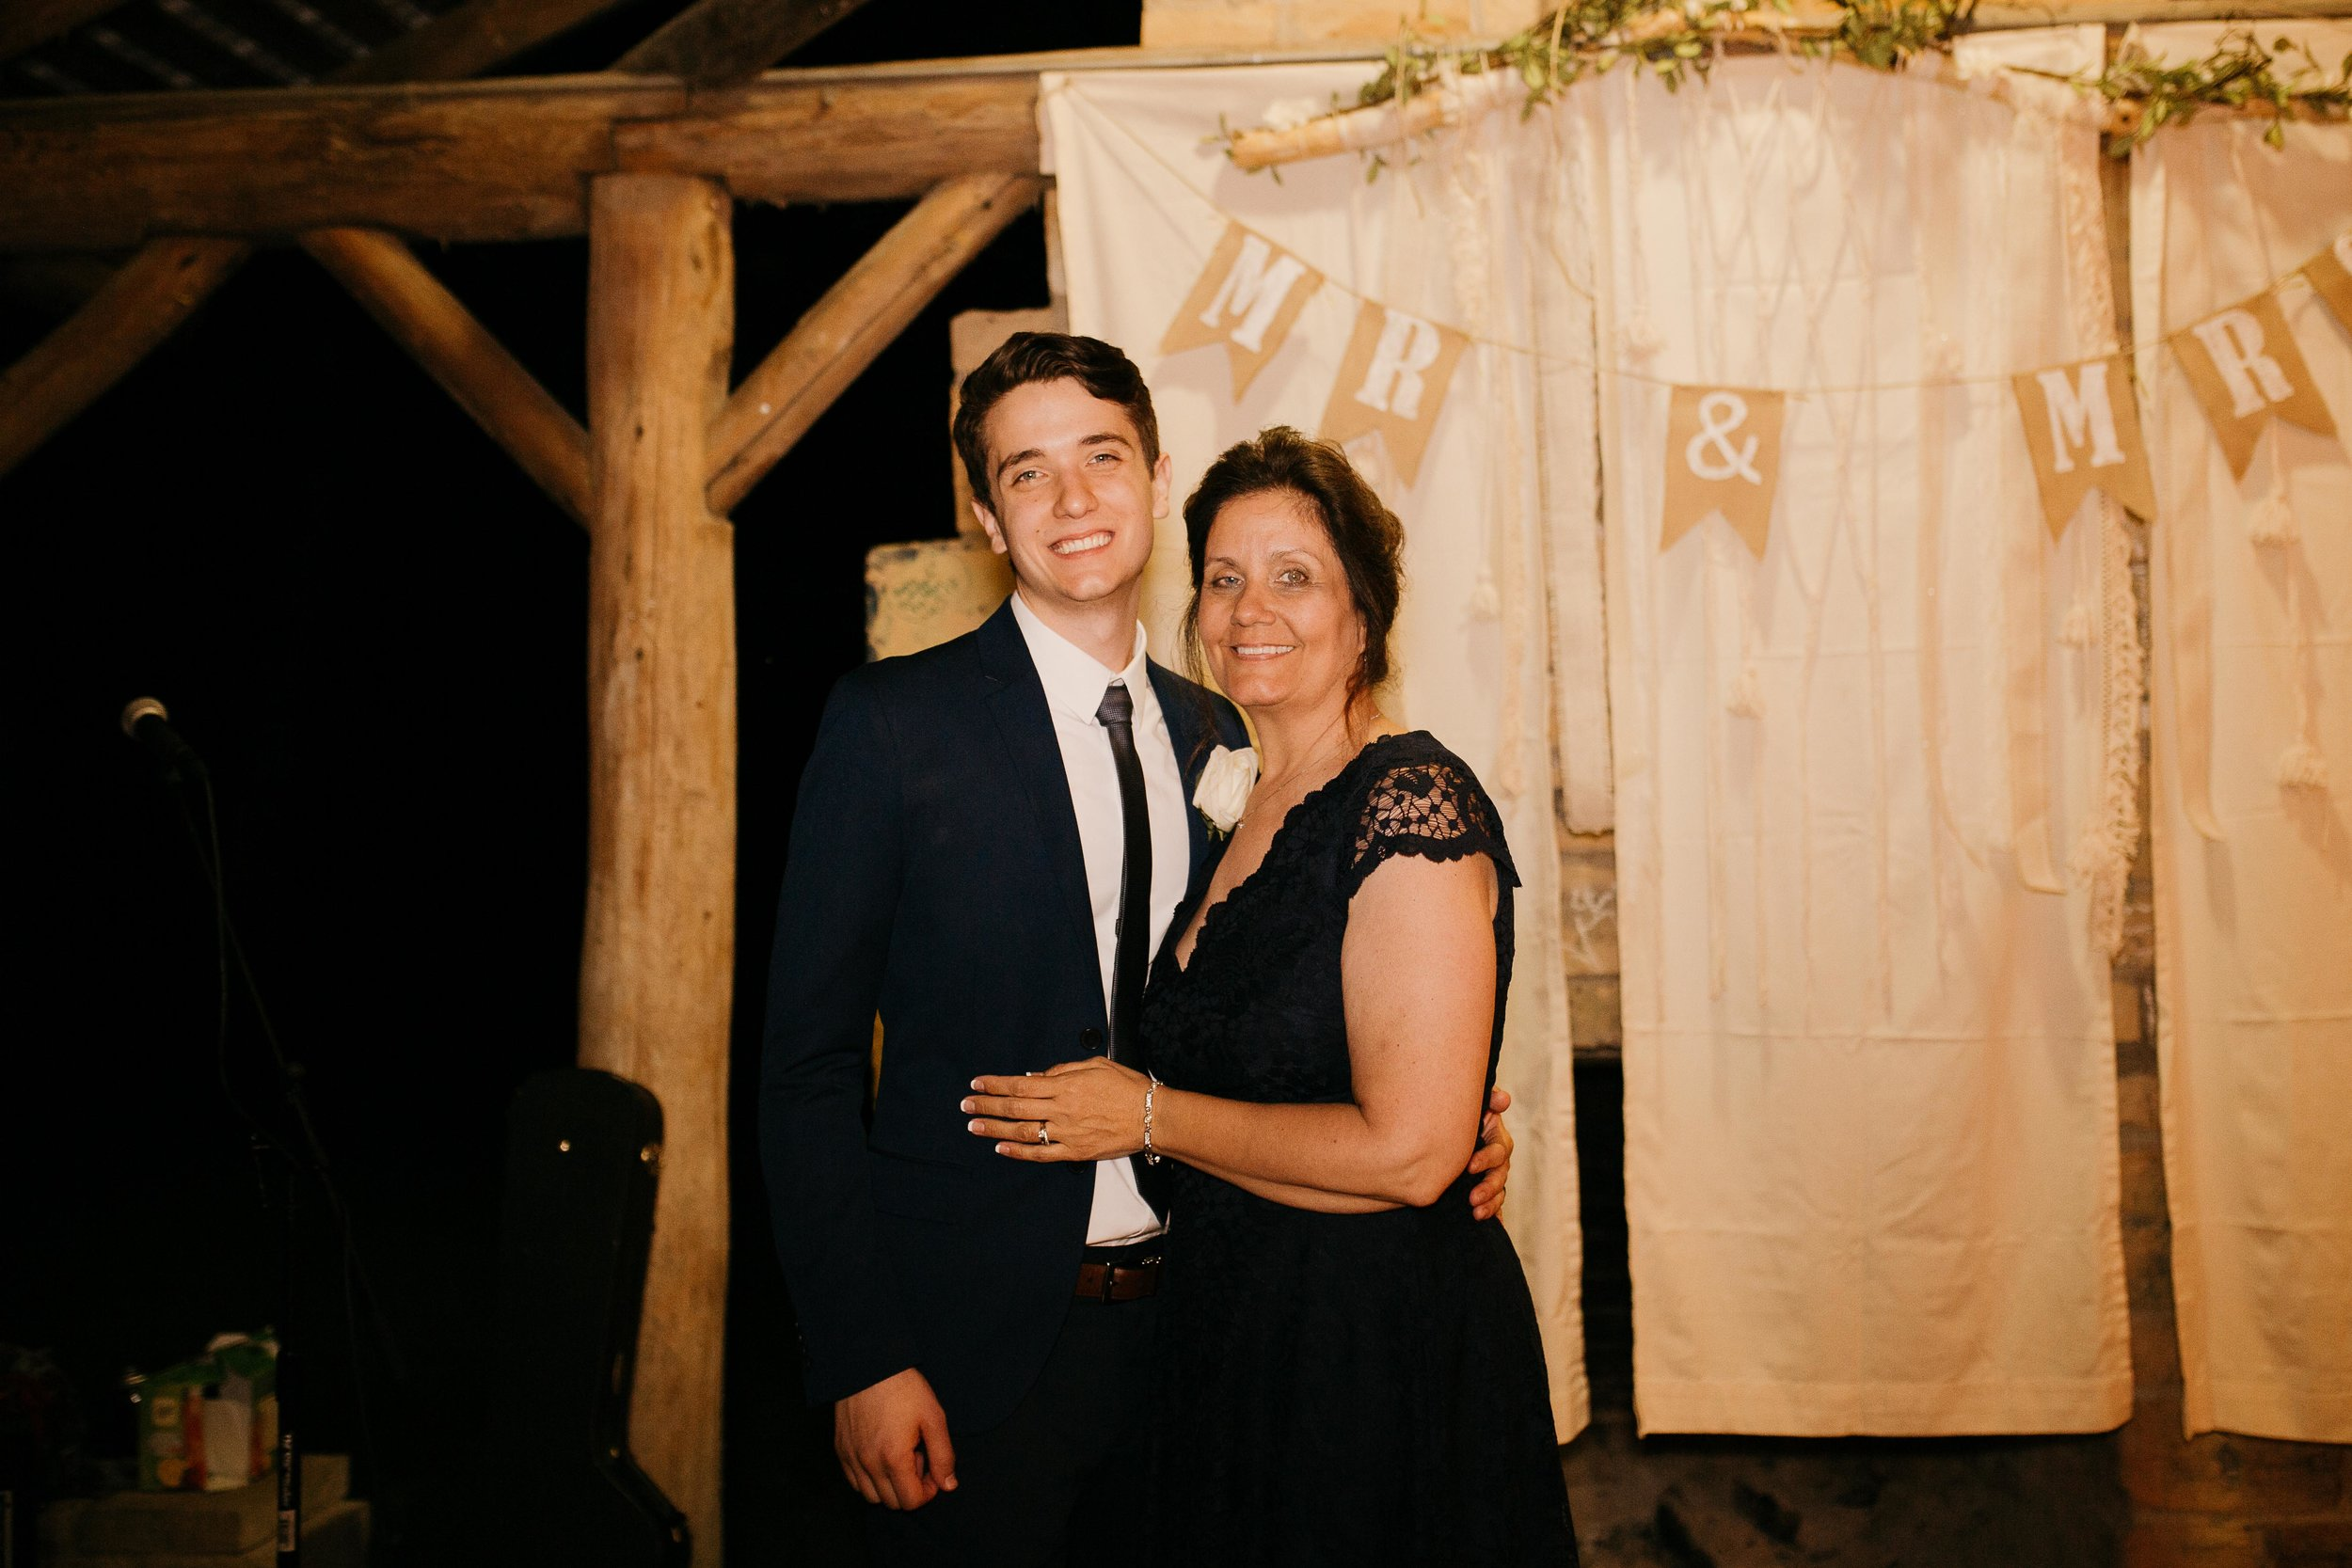 memphis tn wedding-146.jpg